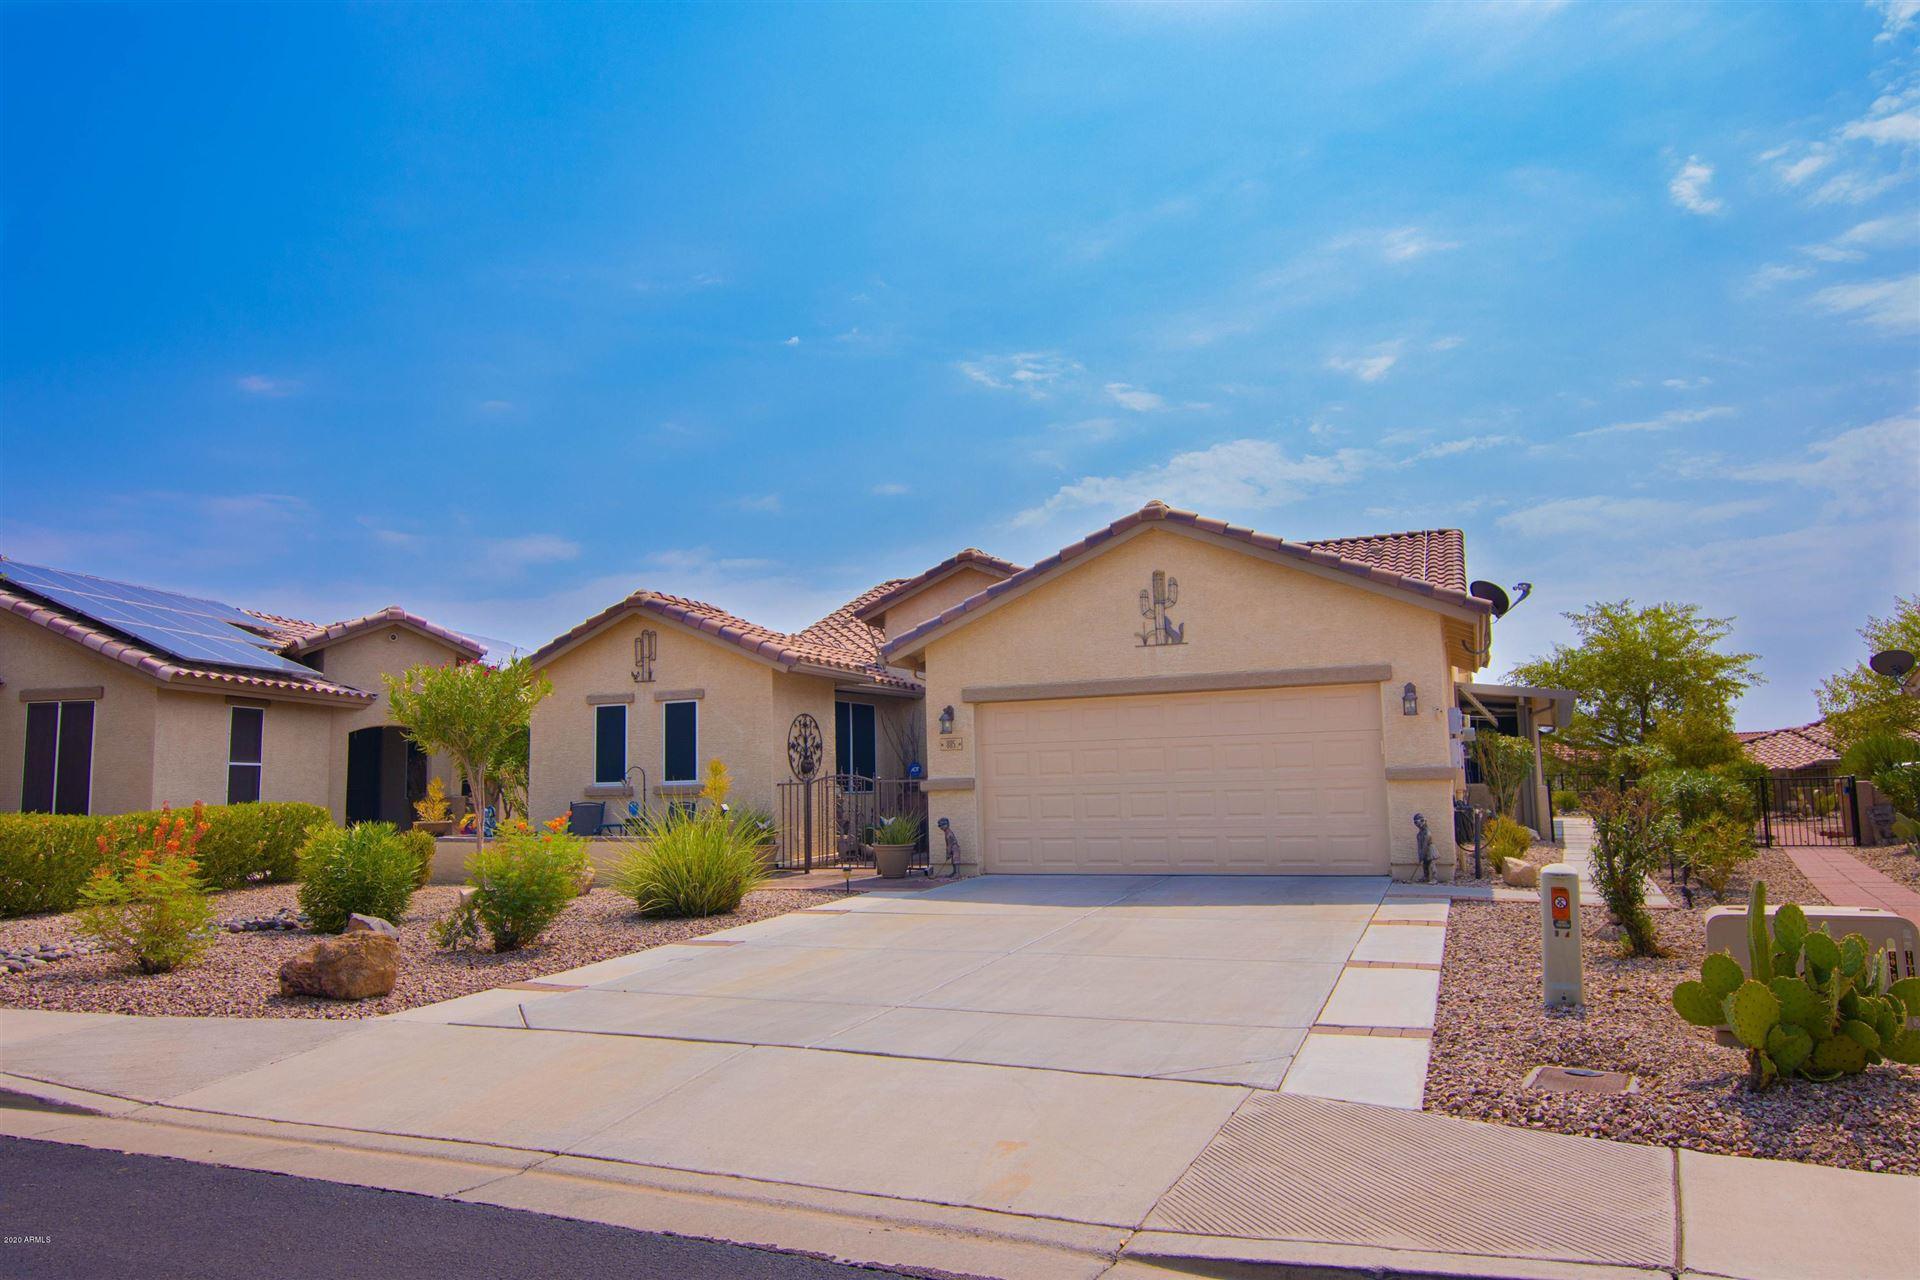 885 S 230TH Avenue, Buckeye, AZ 85326 - MLS#: 6126231